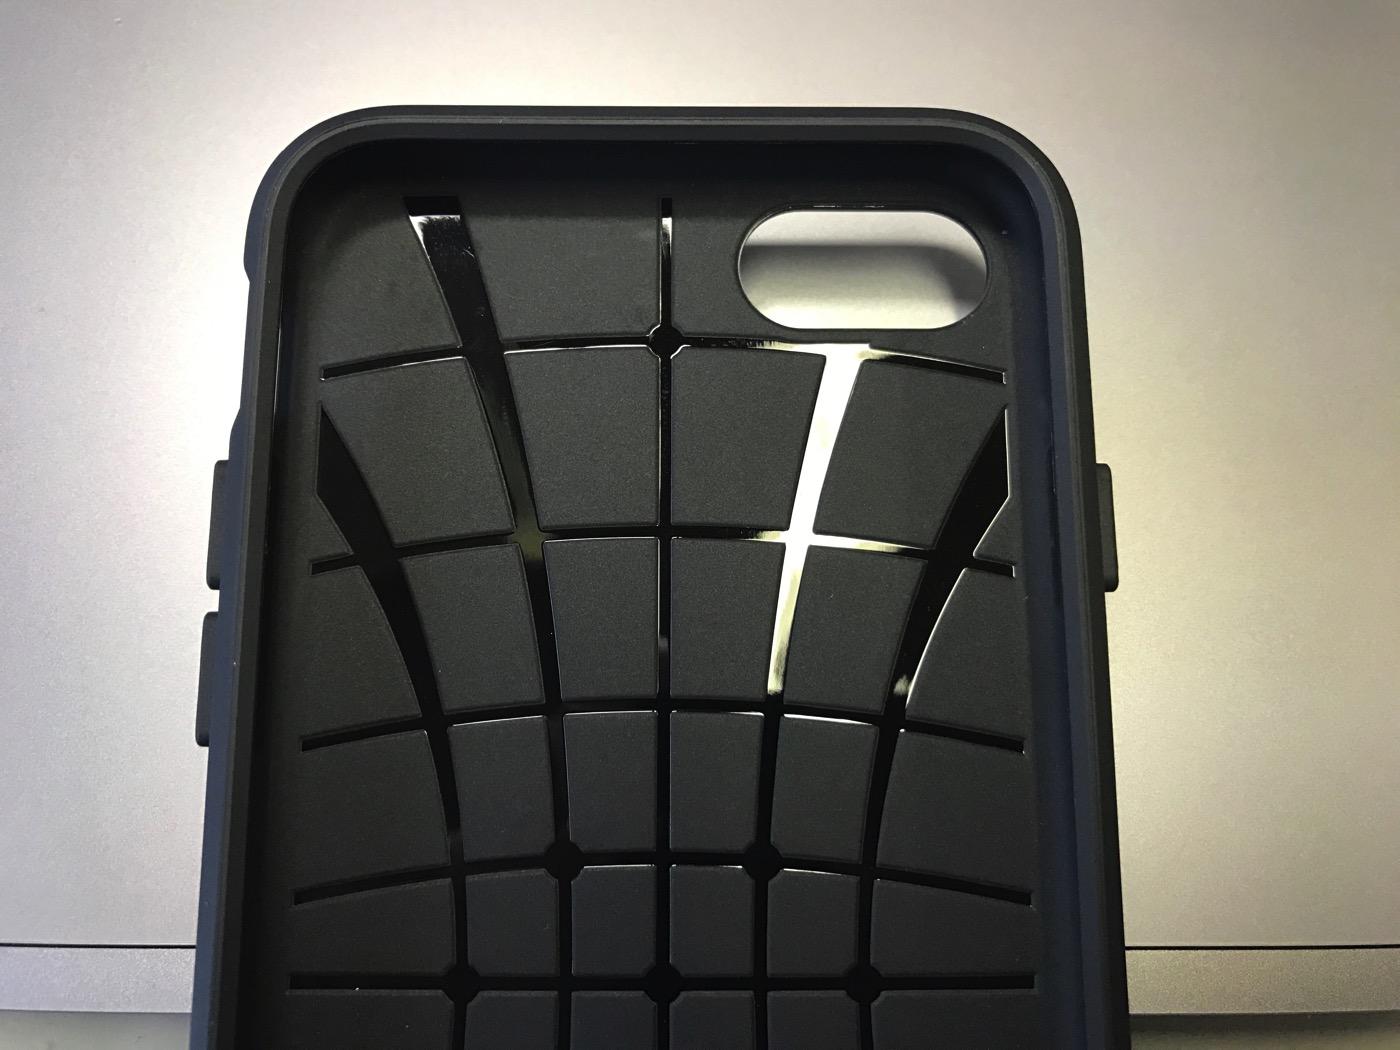 iPhoneケース「ネオ・ハイブリッド米軍MIL規格取得 二重構造バンパー」-9